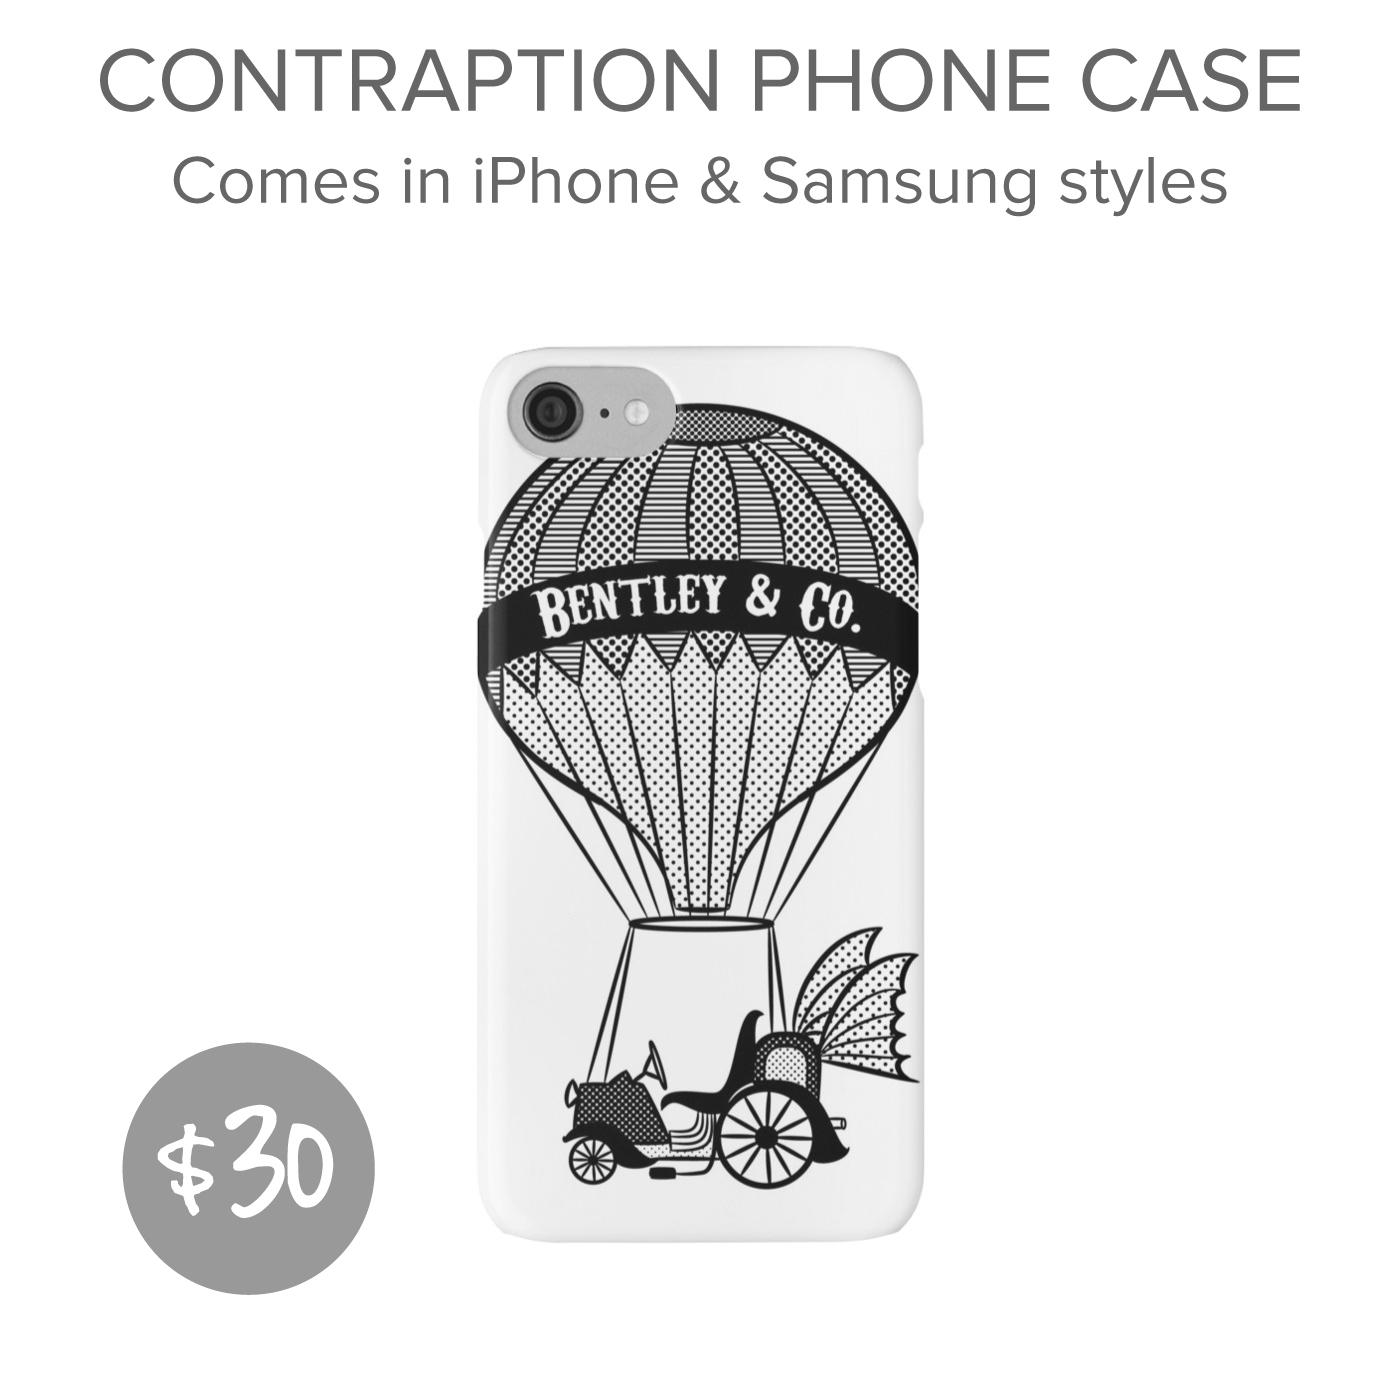 CONTRAPTION-PHONE-CASE.jpg